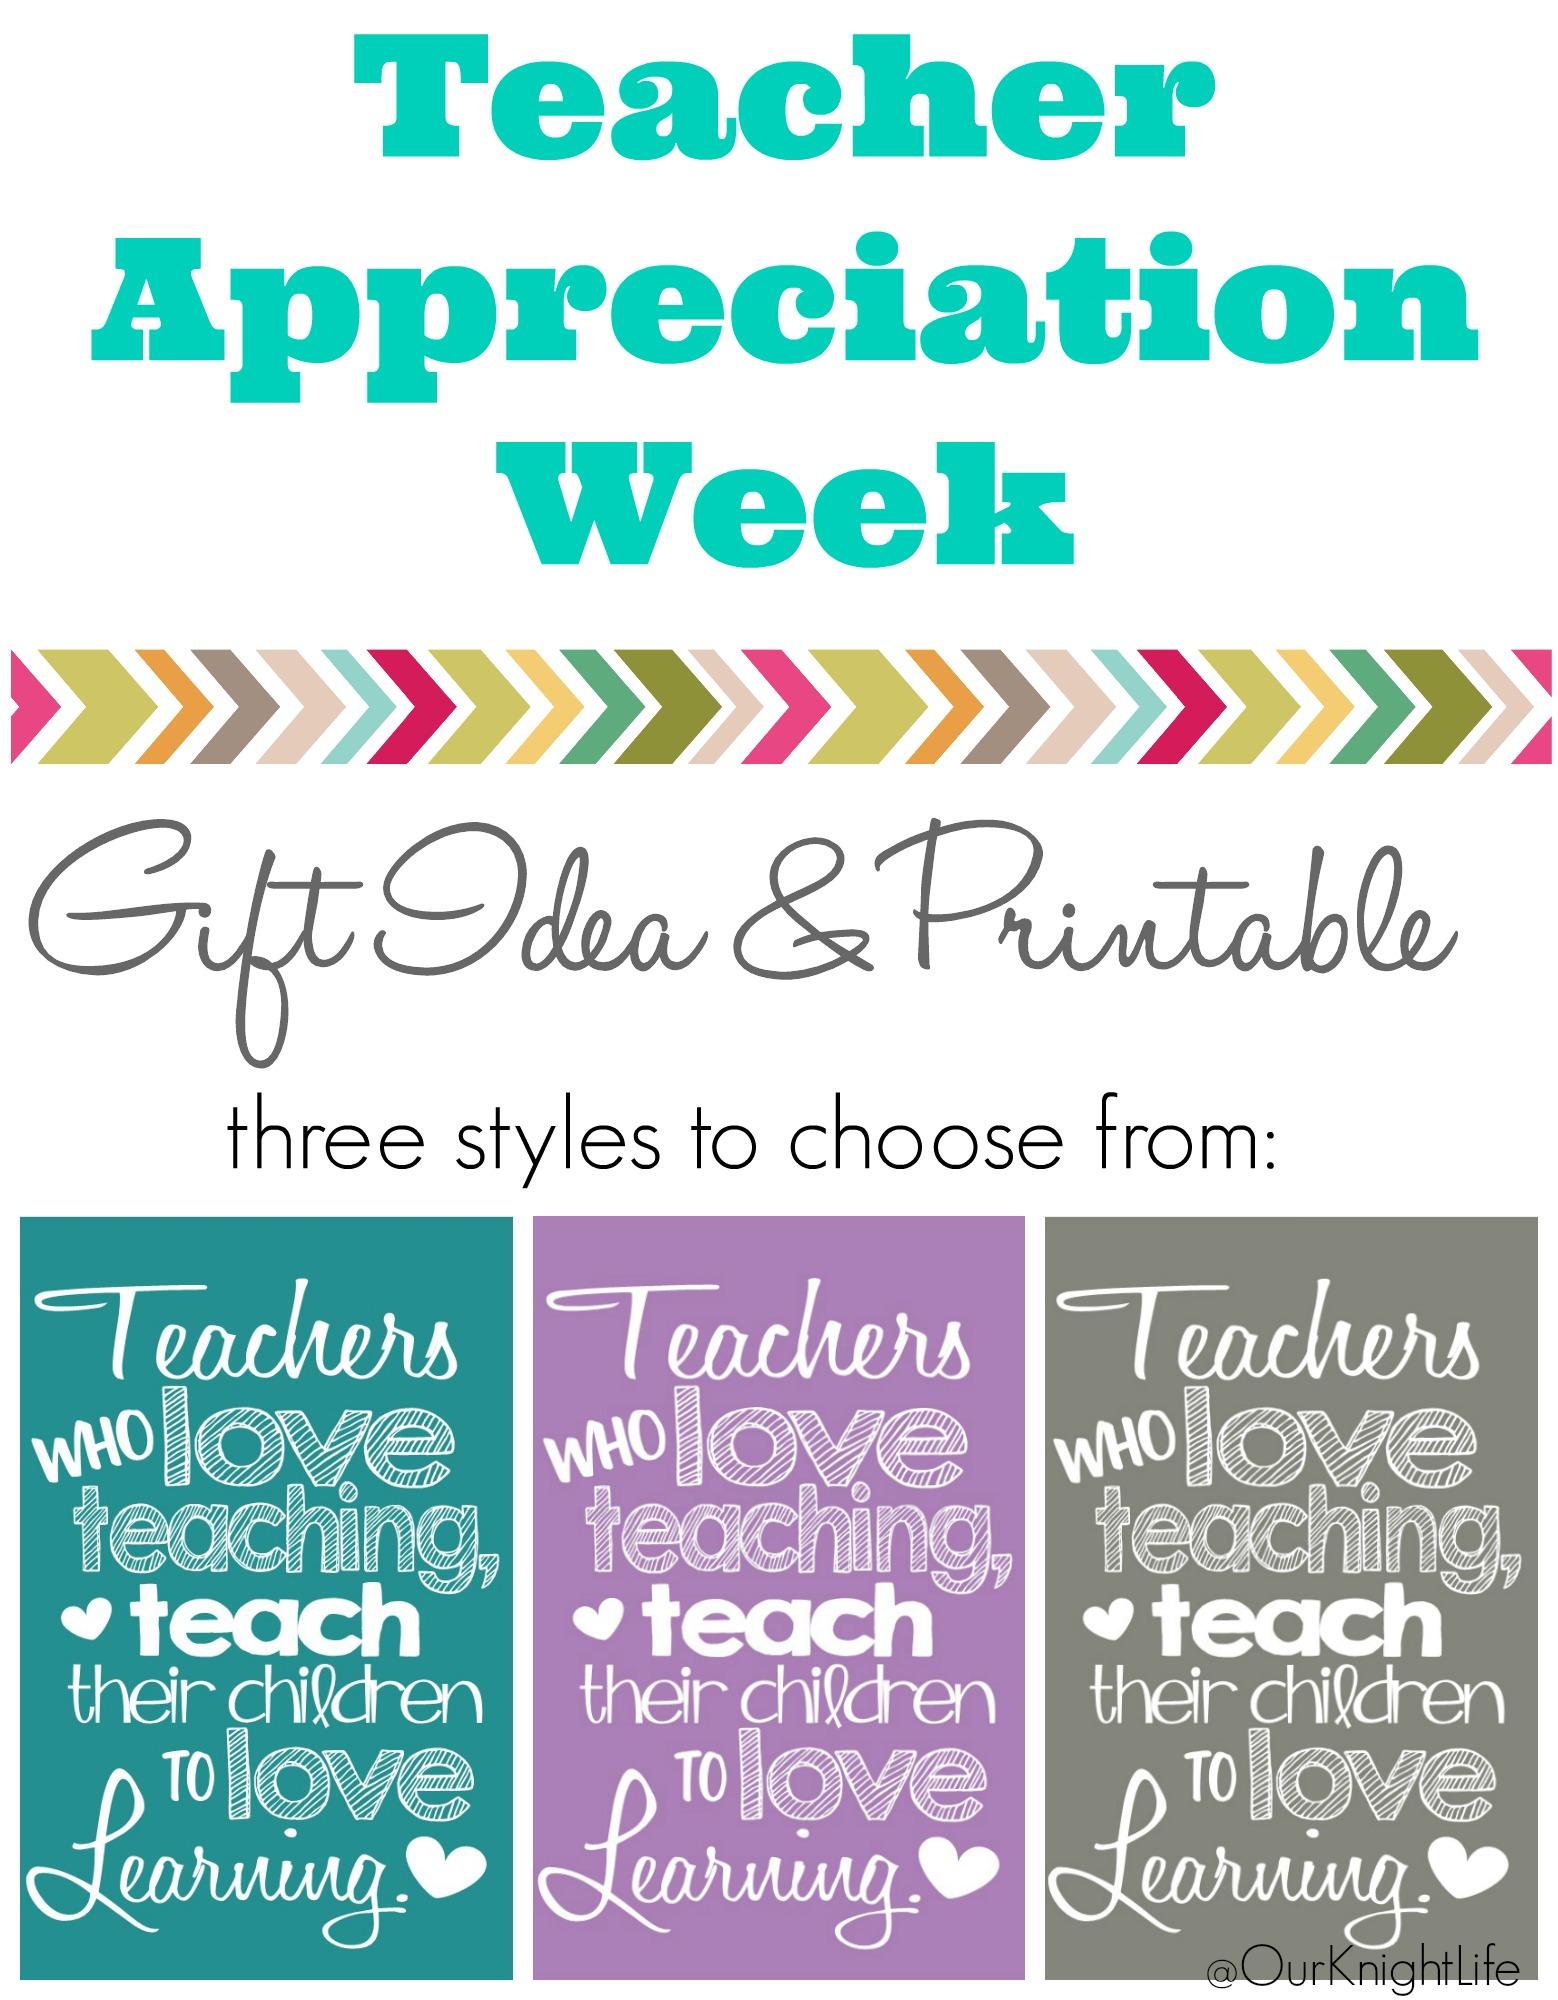 Free Teacher Appreciation Printable - Teachers who love teaching